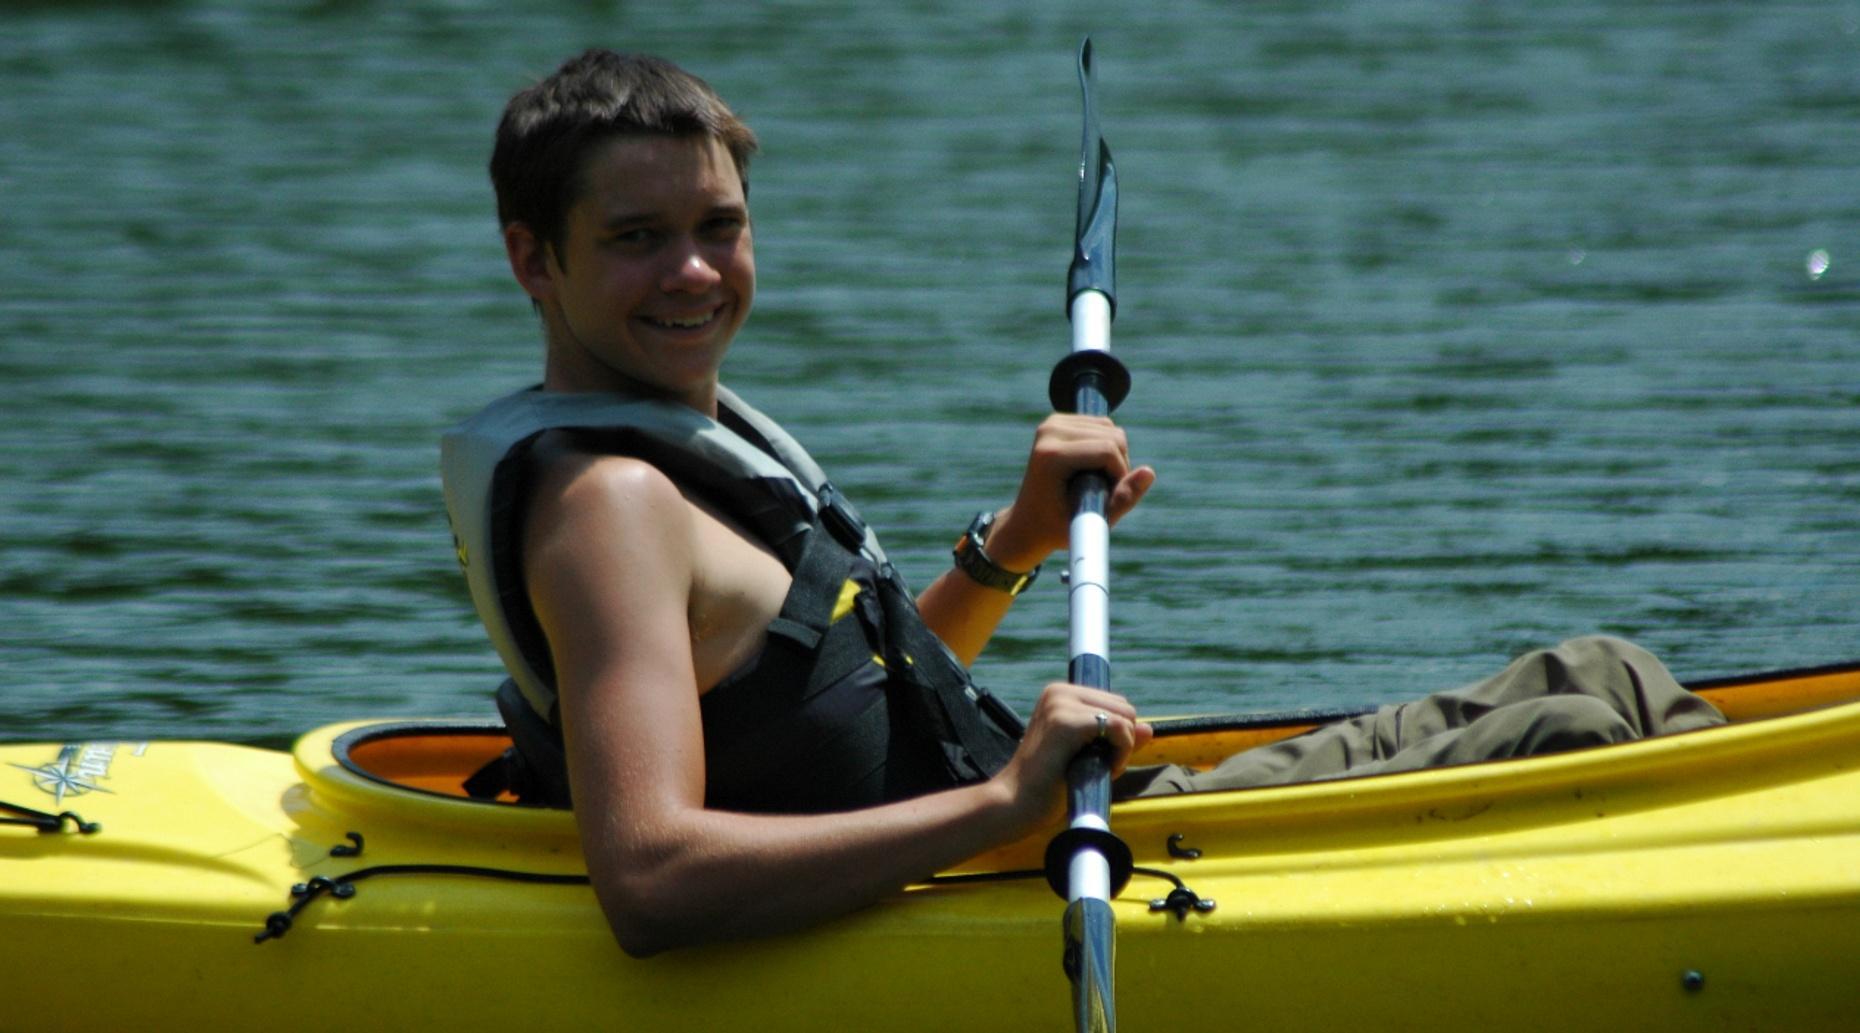 Half-Day Single Person Kayak Rental in Tampa